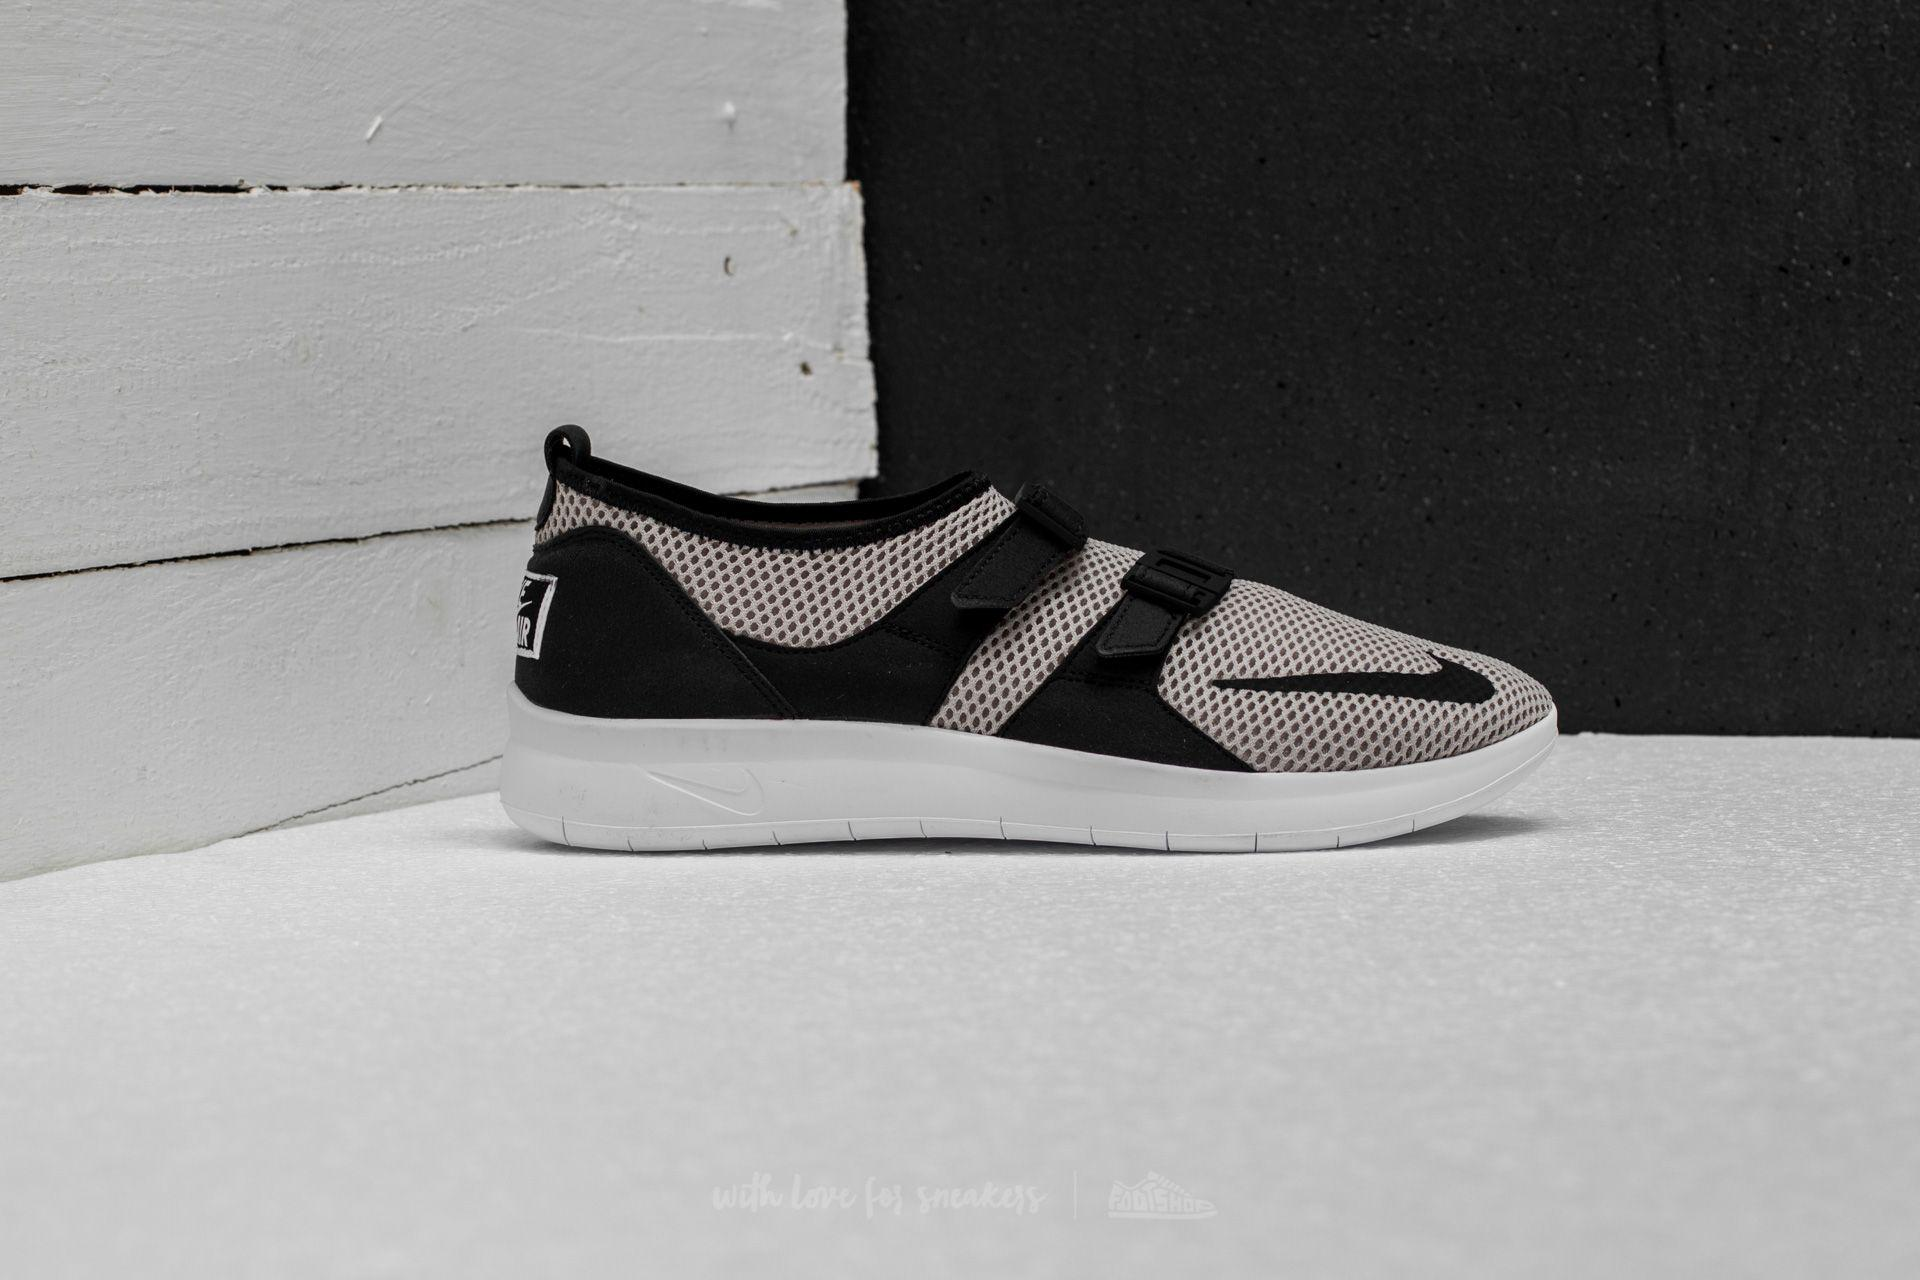 6a09f6a18508 Lyst - Nike Air Sockracer Se Cobblestone  Black-white-volt in Black ...